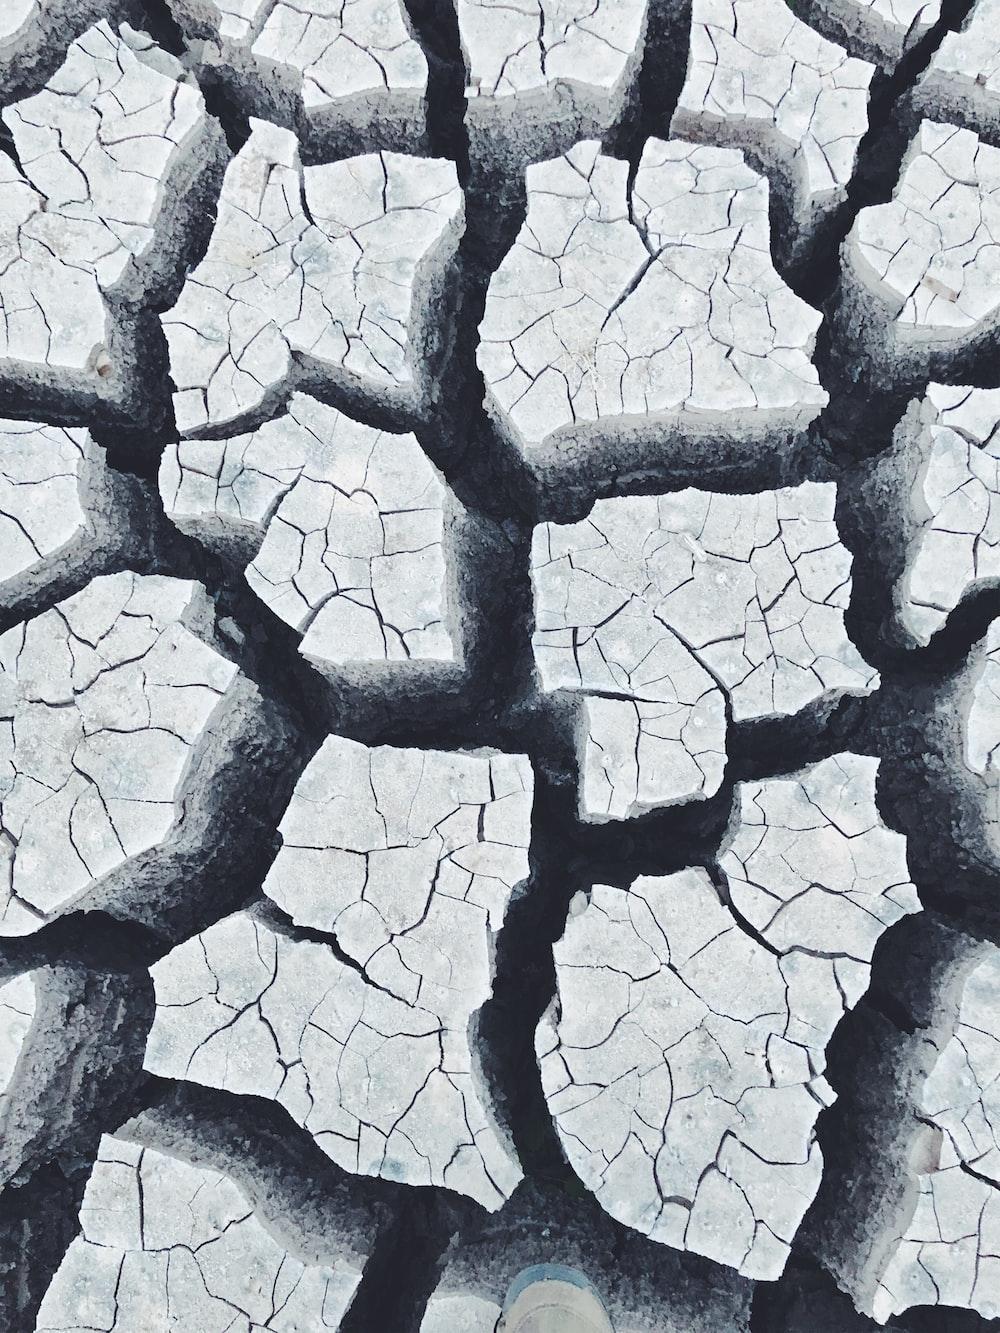 20 Crack Pictures Download Free Images On Unsplash